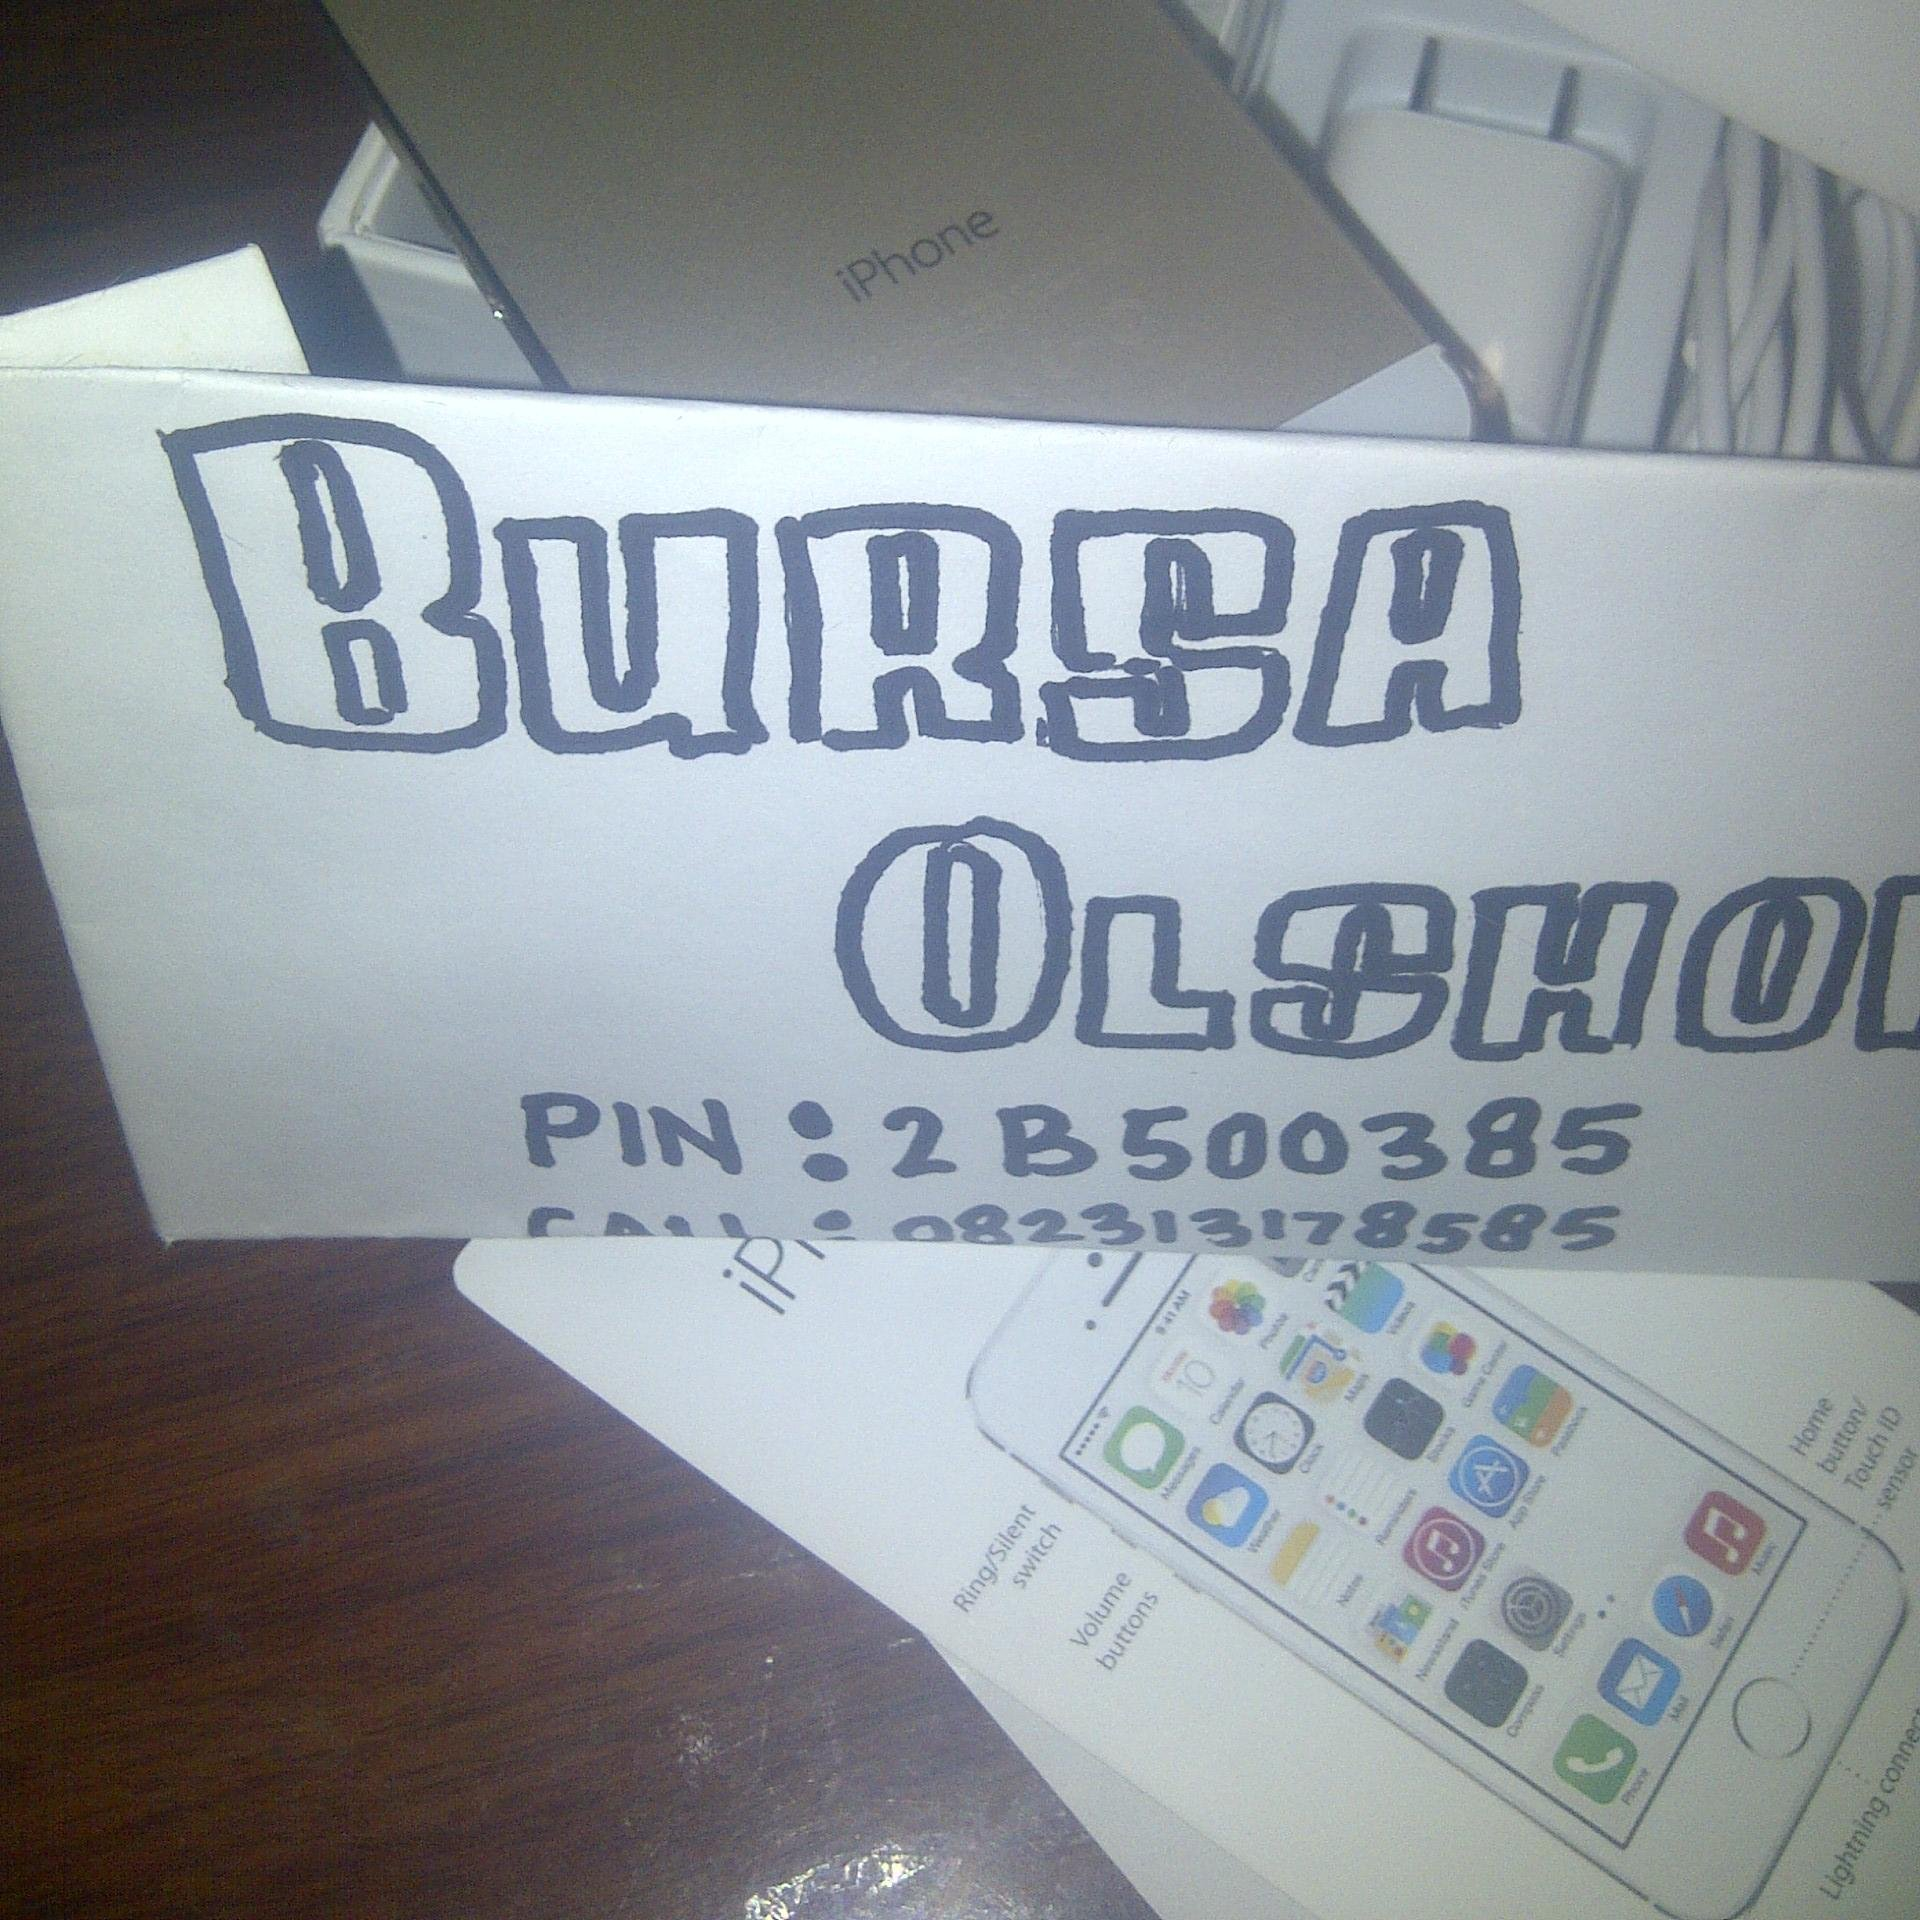 @BurRsa_oLshop7